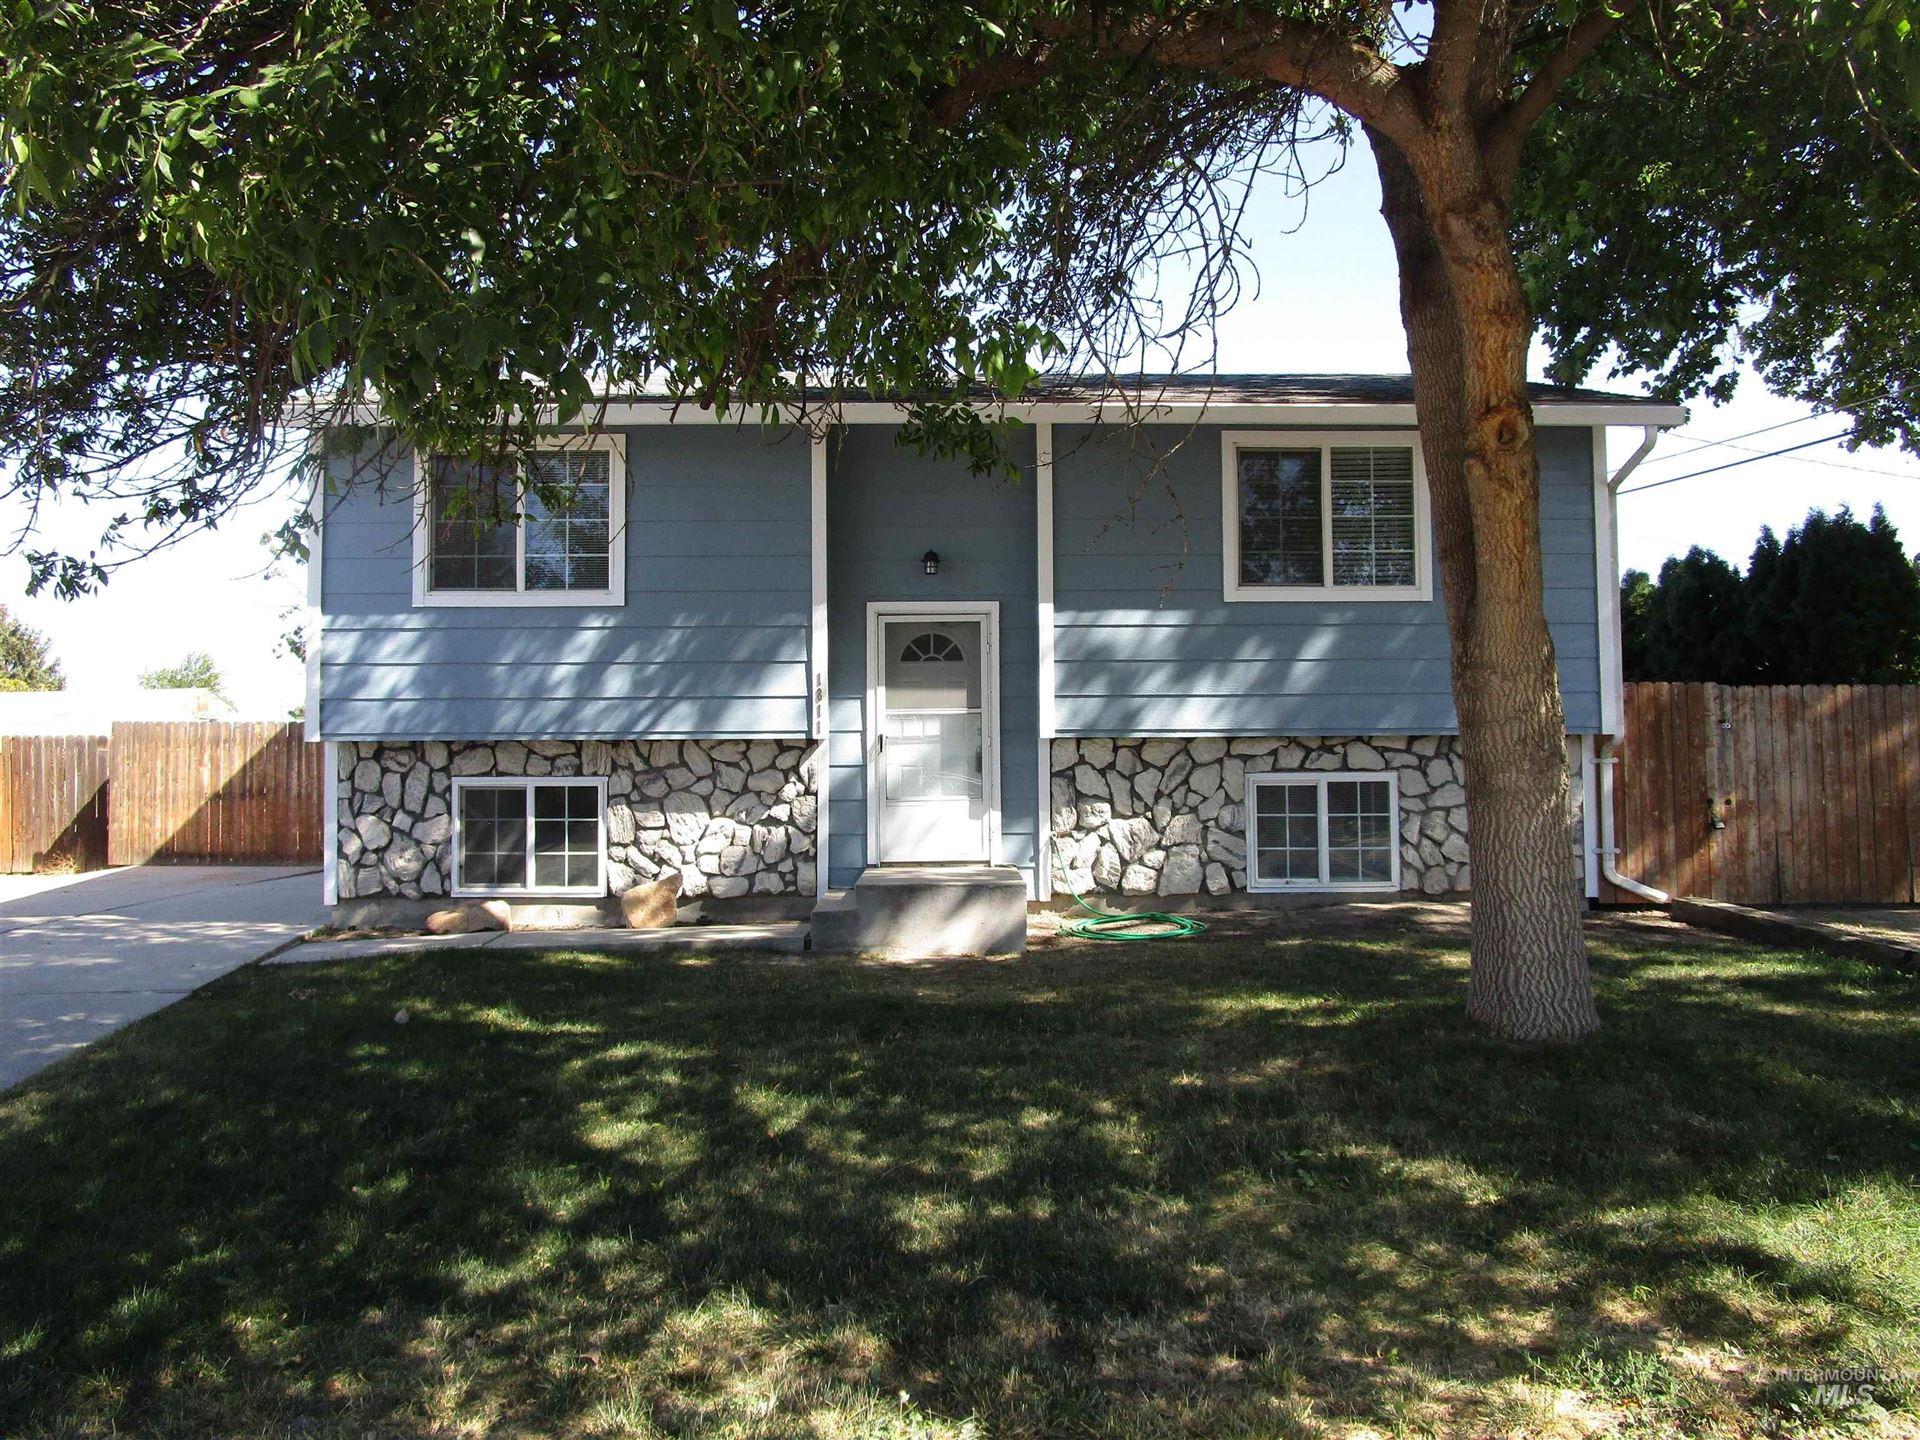 Photo of 1811 Carol Ave, Caldwell, ID 83605-4772 (MLS # 98819309)